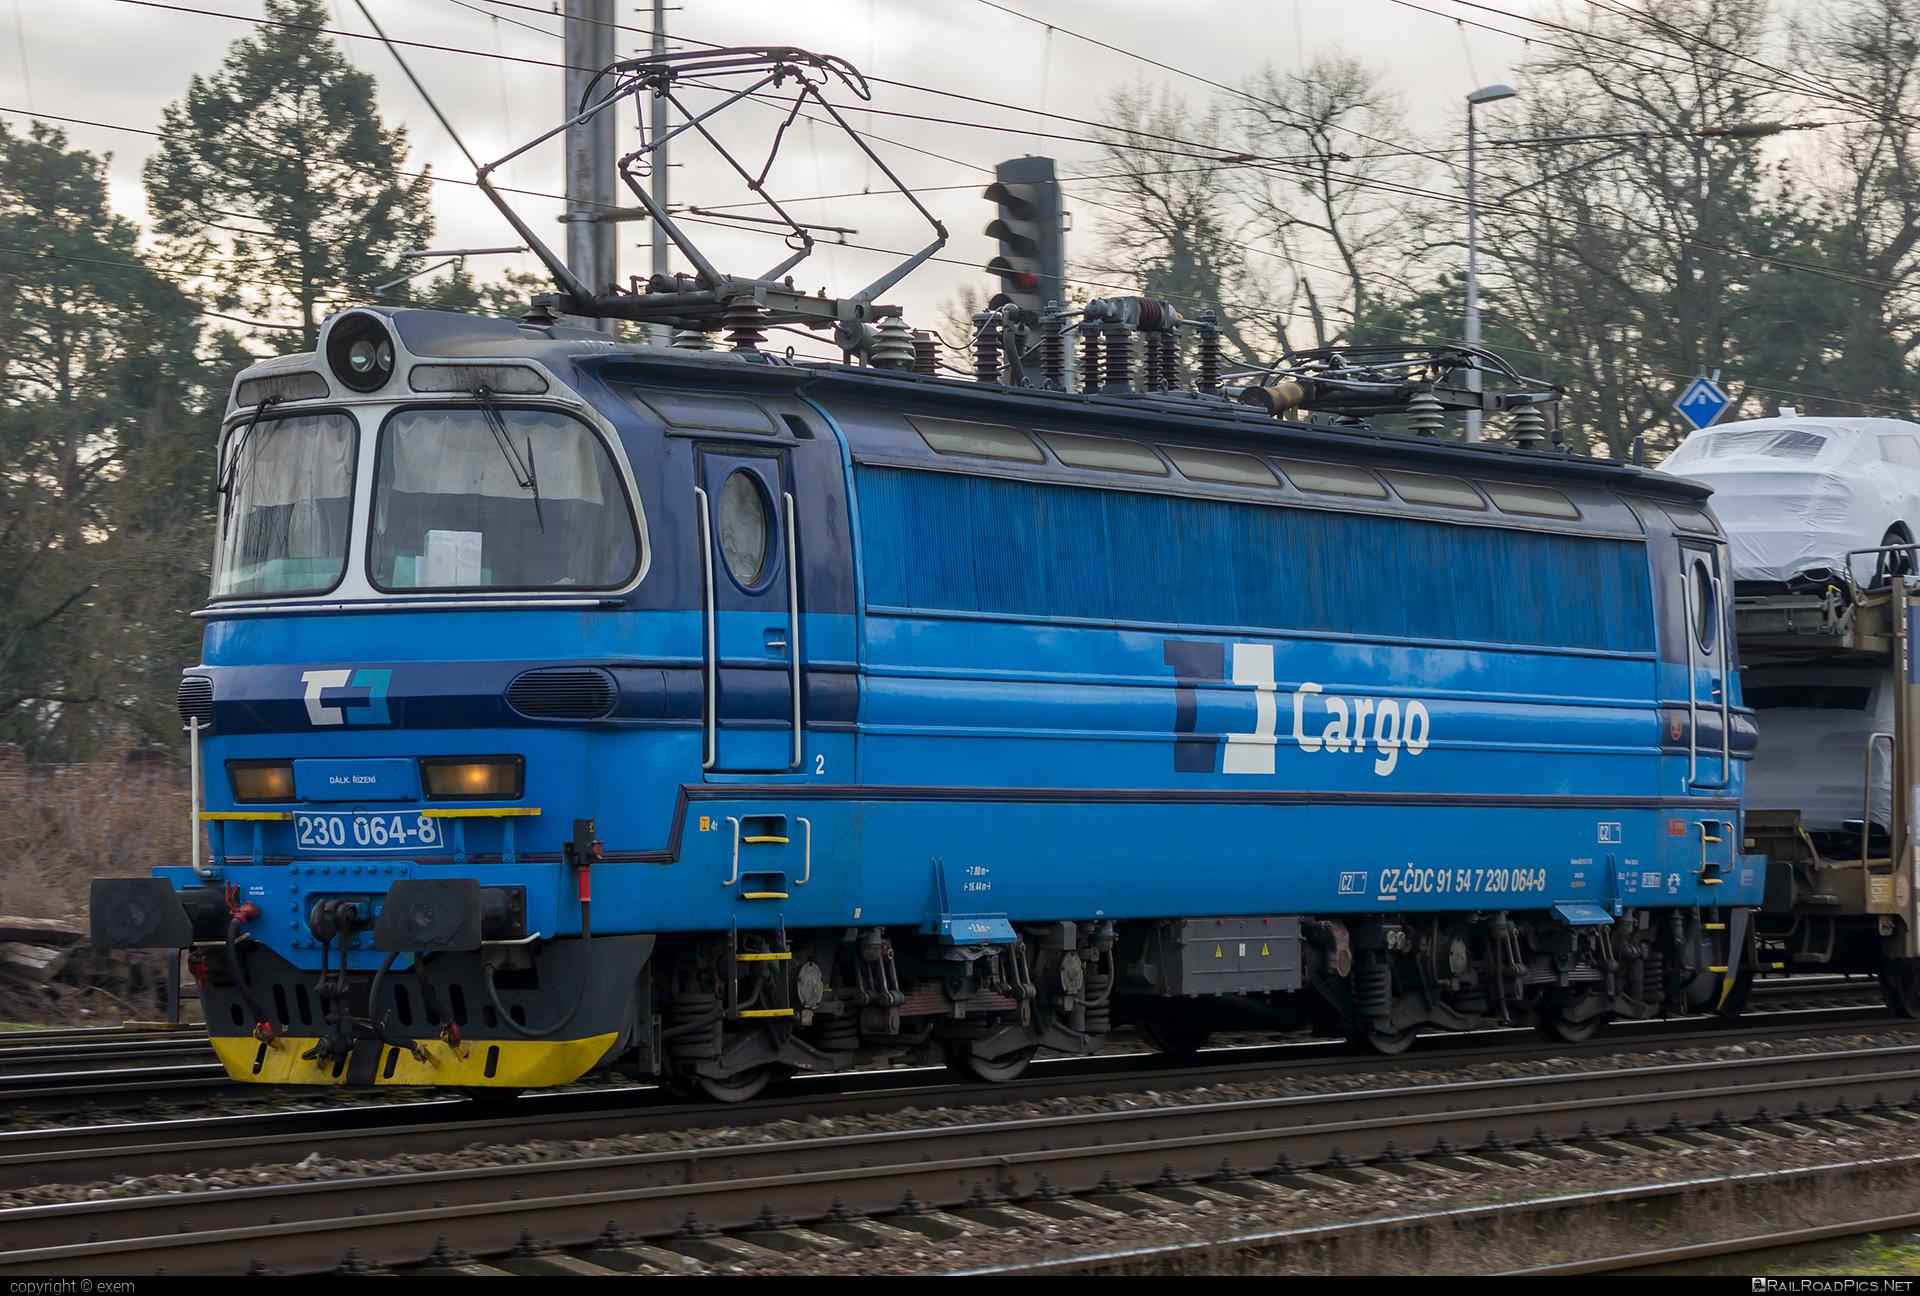 Škoda 47E - 230 064-8 operated by ČD Cargo, a.s. #cdcargo #laminatka #locomotive240 #skoda #skoda47e